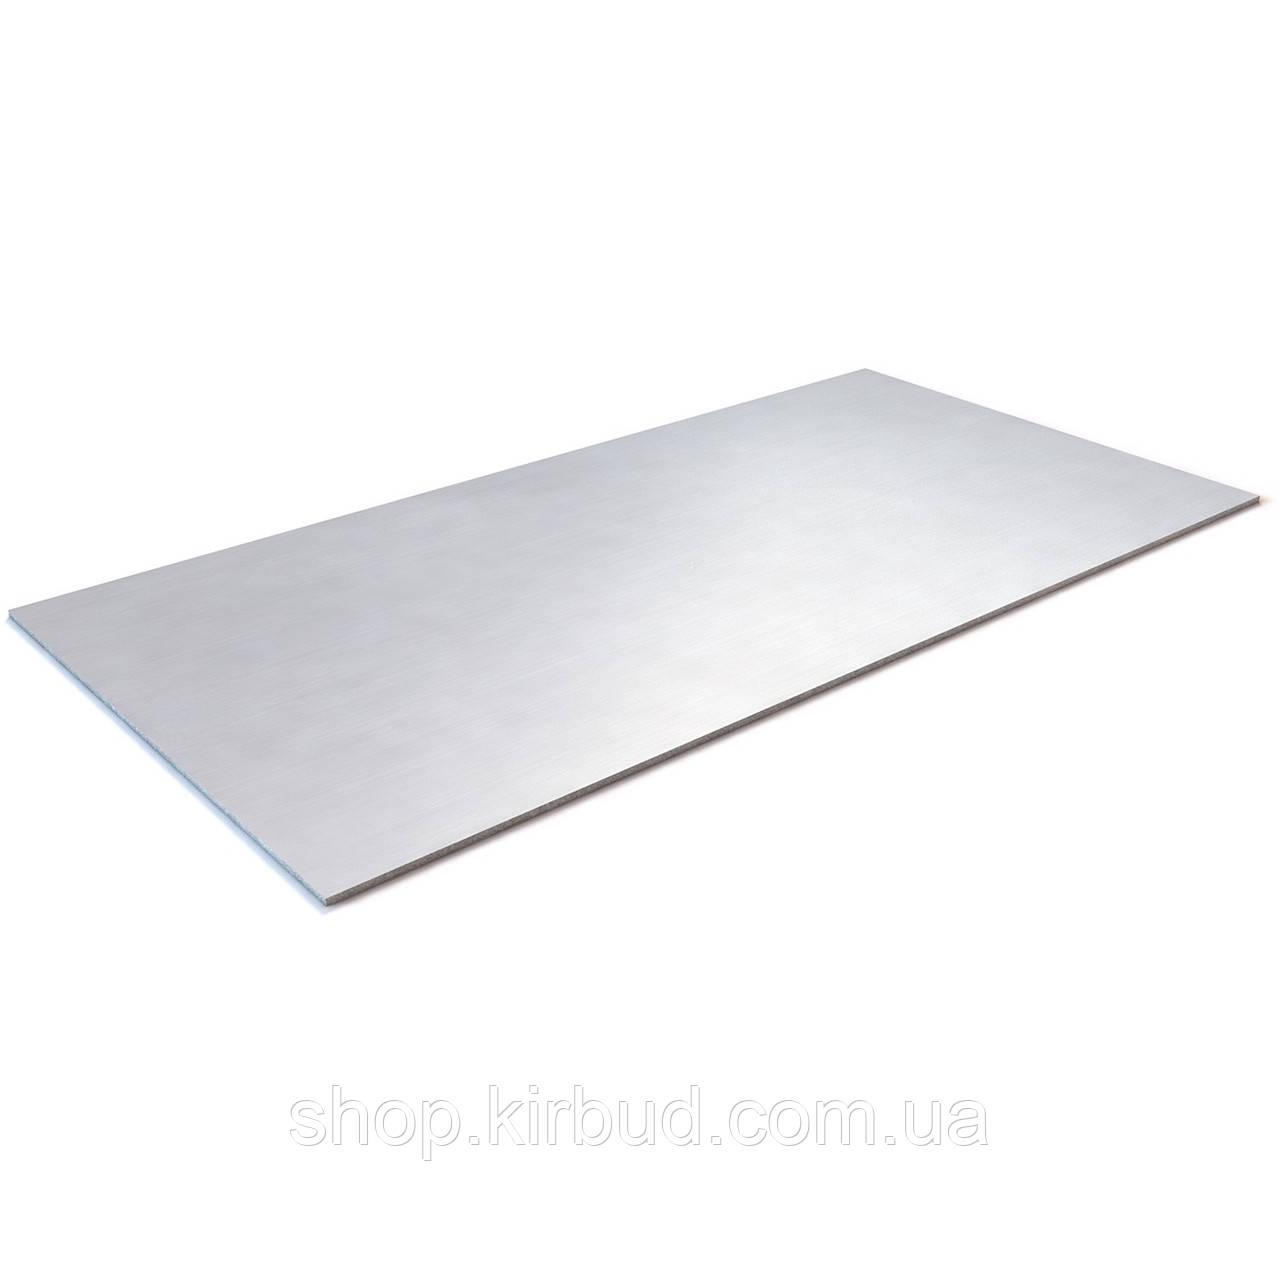 Лист х/к 0,8мм ст.08кп 1,25х2,5м